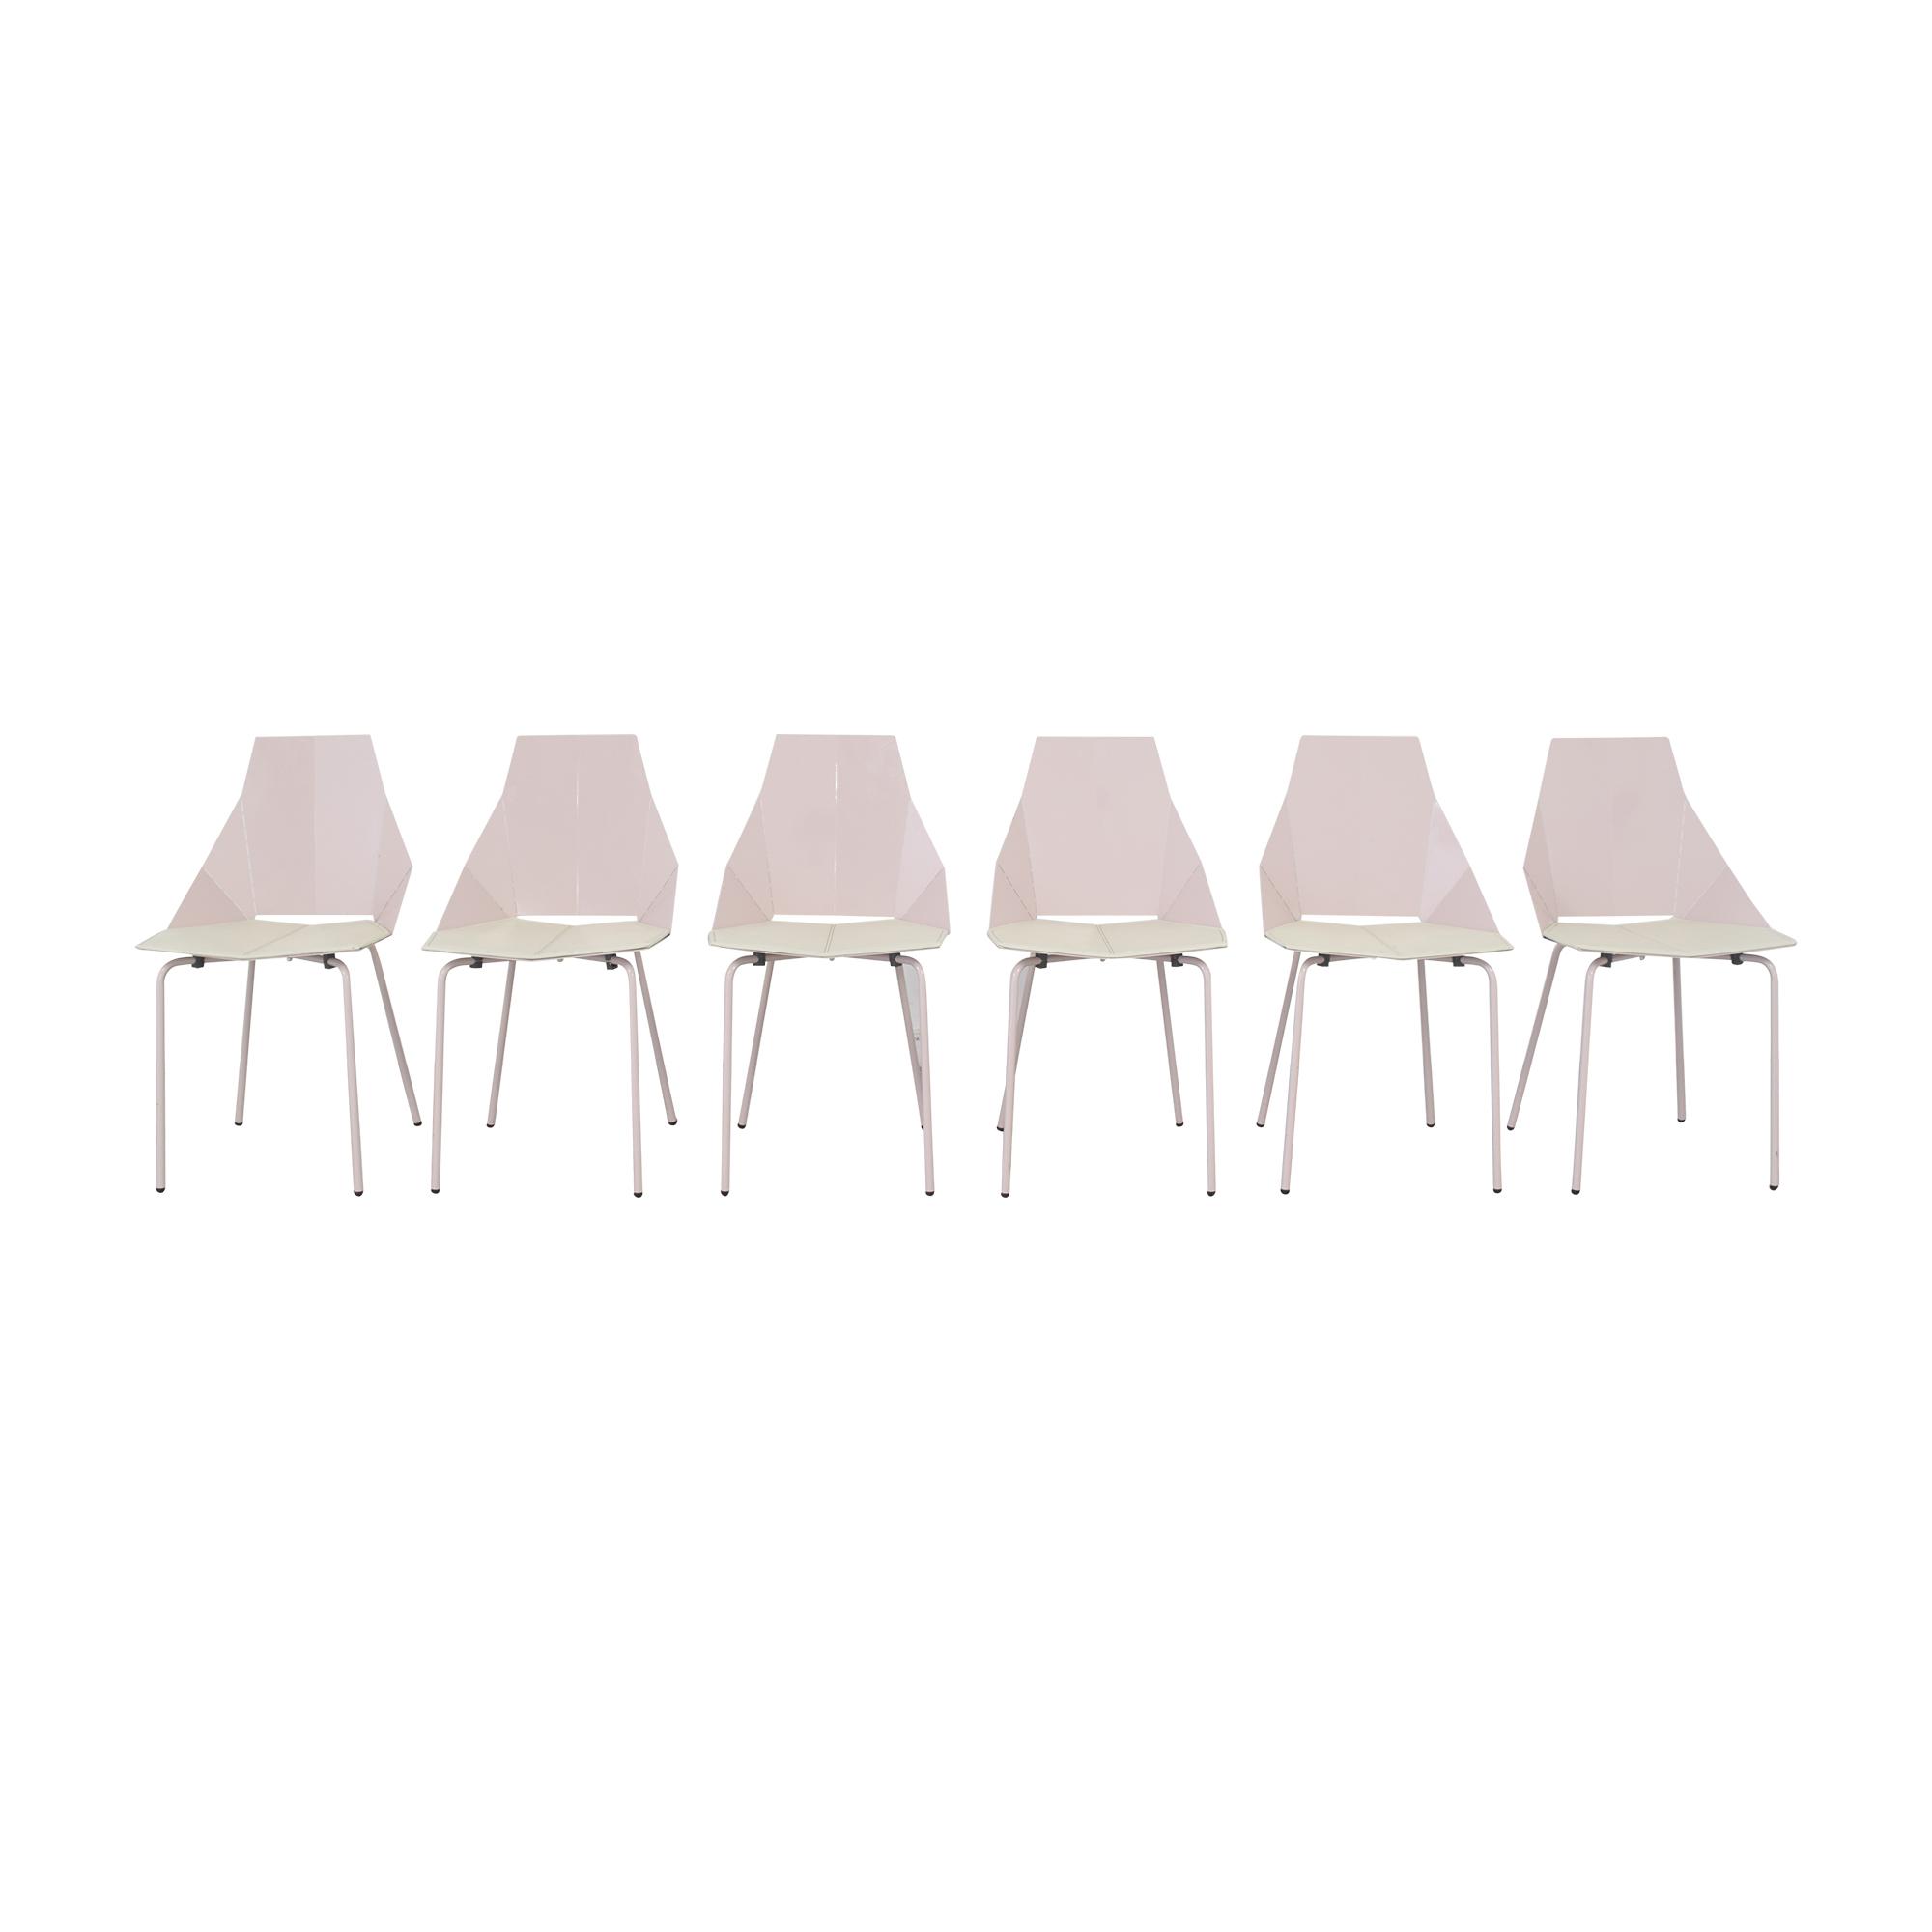 Blu Dot Blu Dot Real Good Chairs used